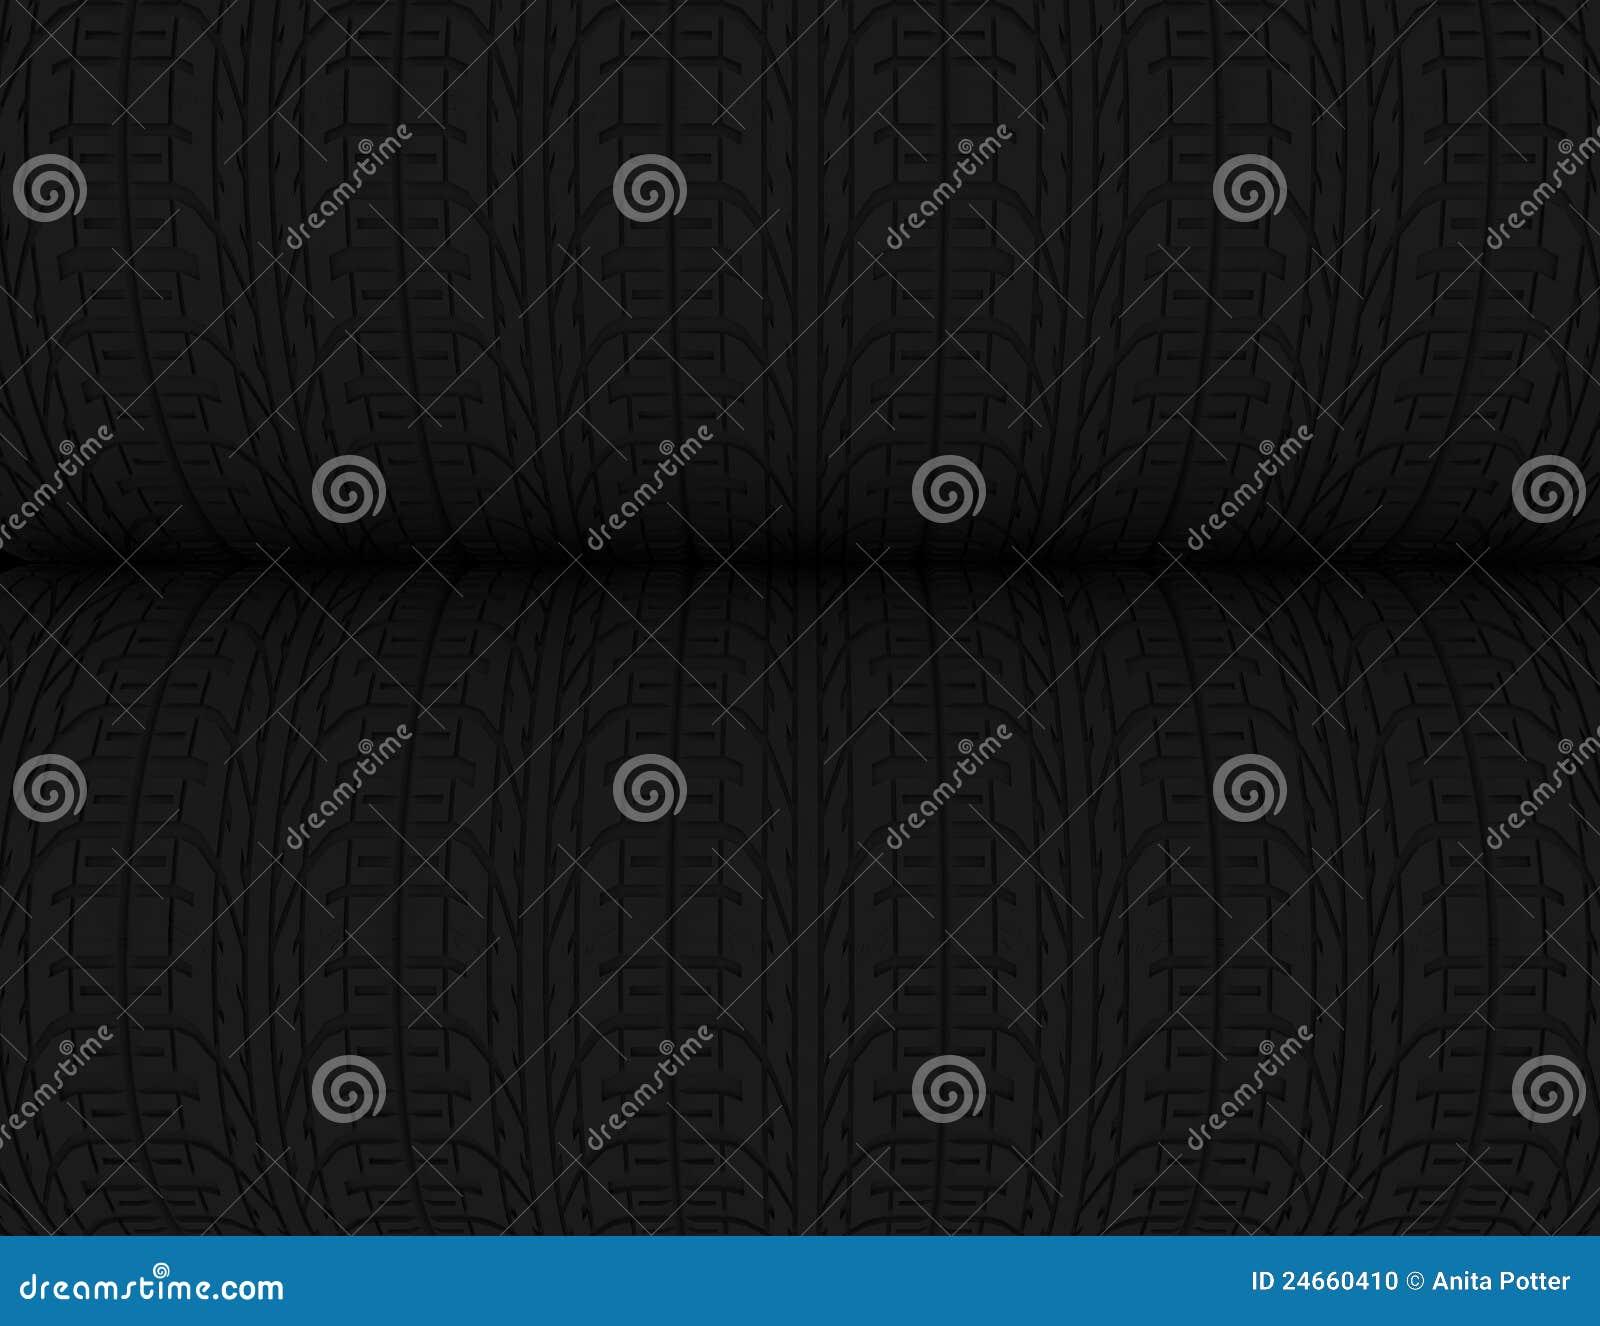 Tire tread background stock illustration image of background 24660410 - Tire tread wallpaper ...